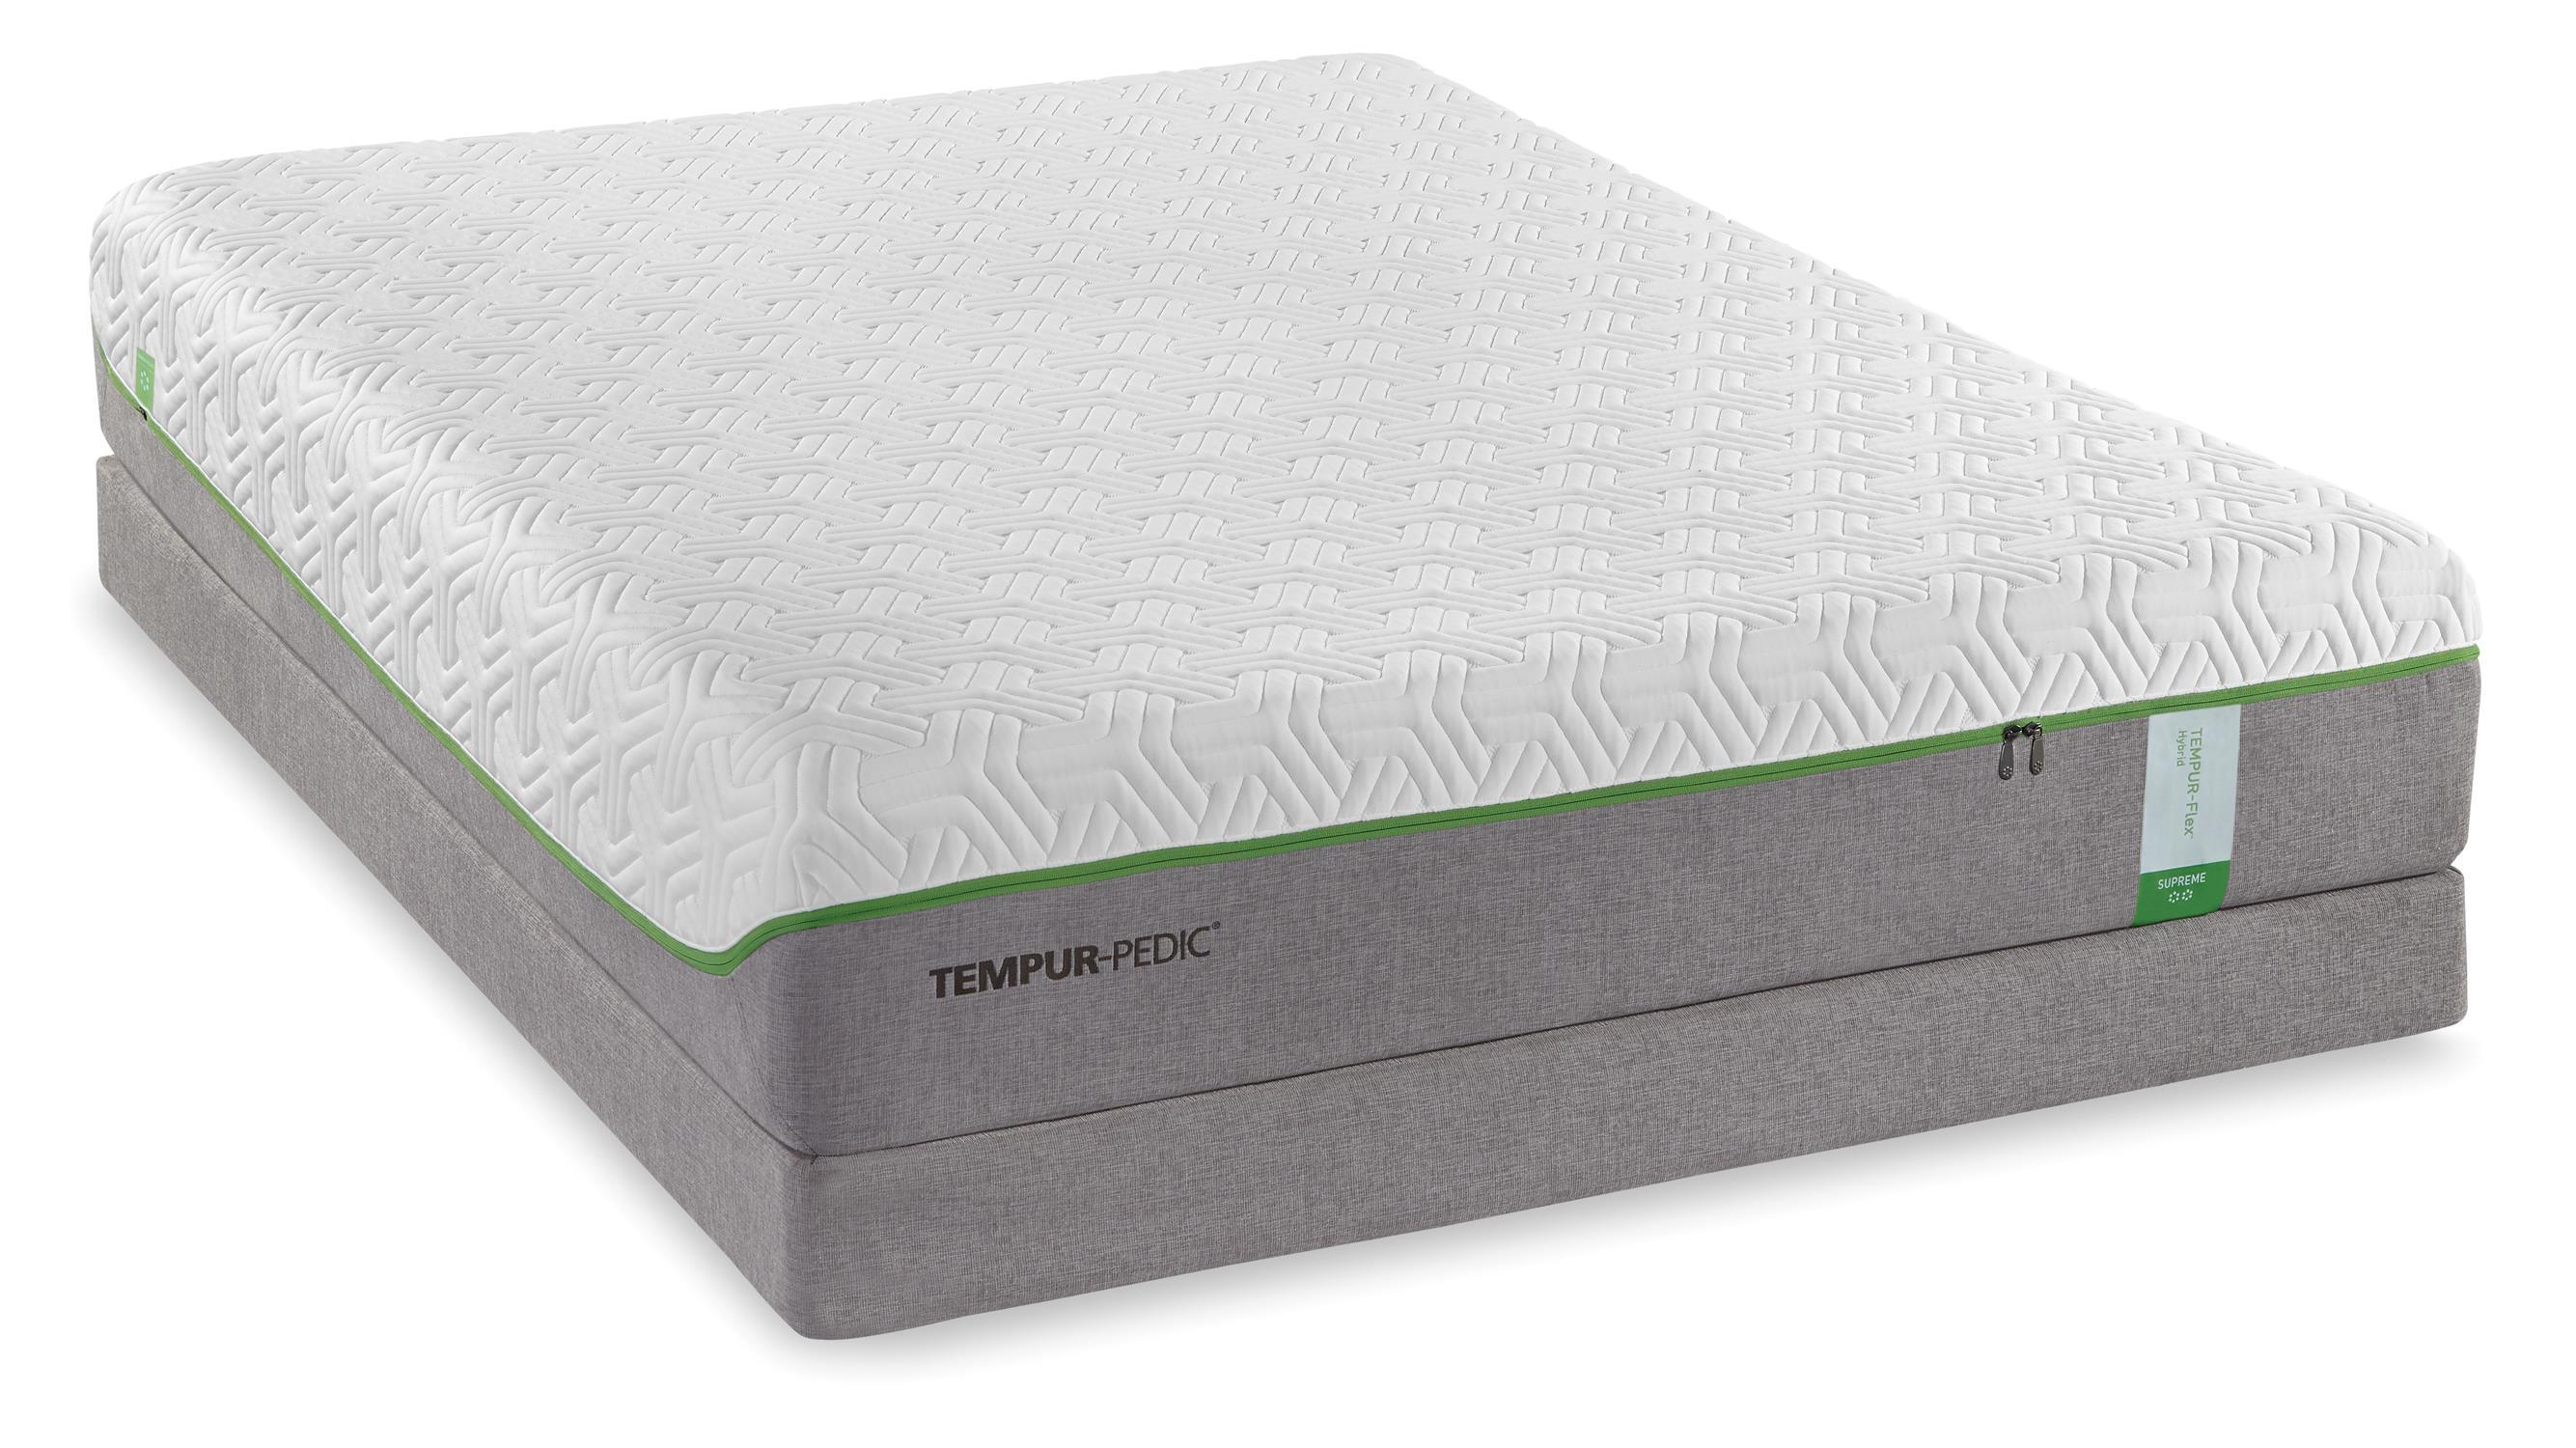 Tempur-Pedic® TEMPUR-Flex Supreme Full Medium Plush Mattress Set - Item Number: 10116130+20510130